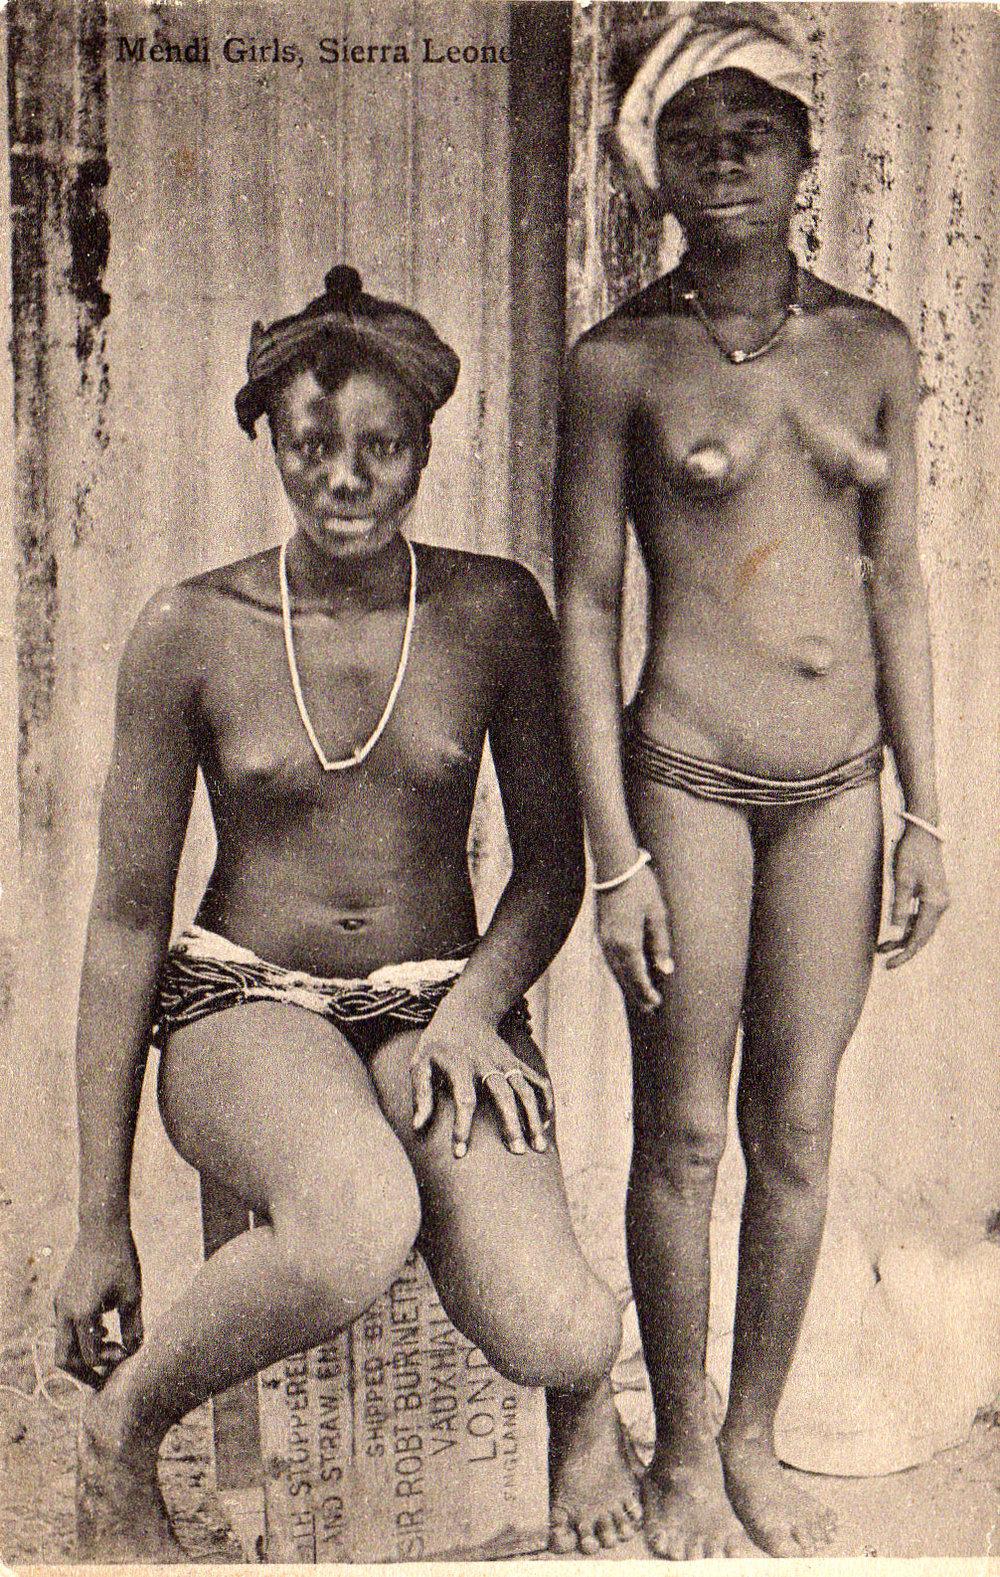 Mendi girls in Sierra Leone.